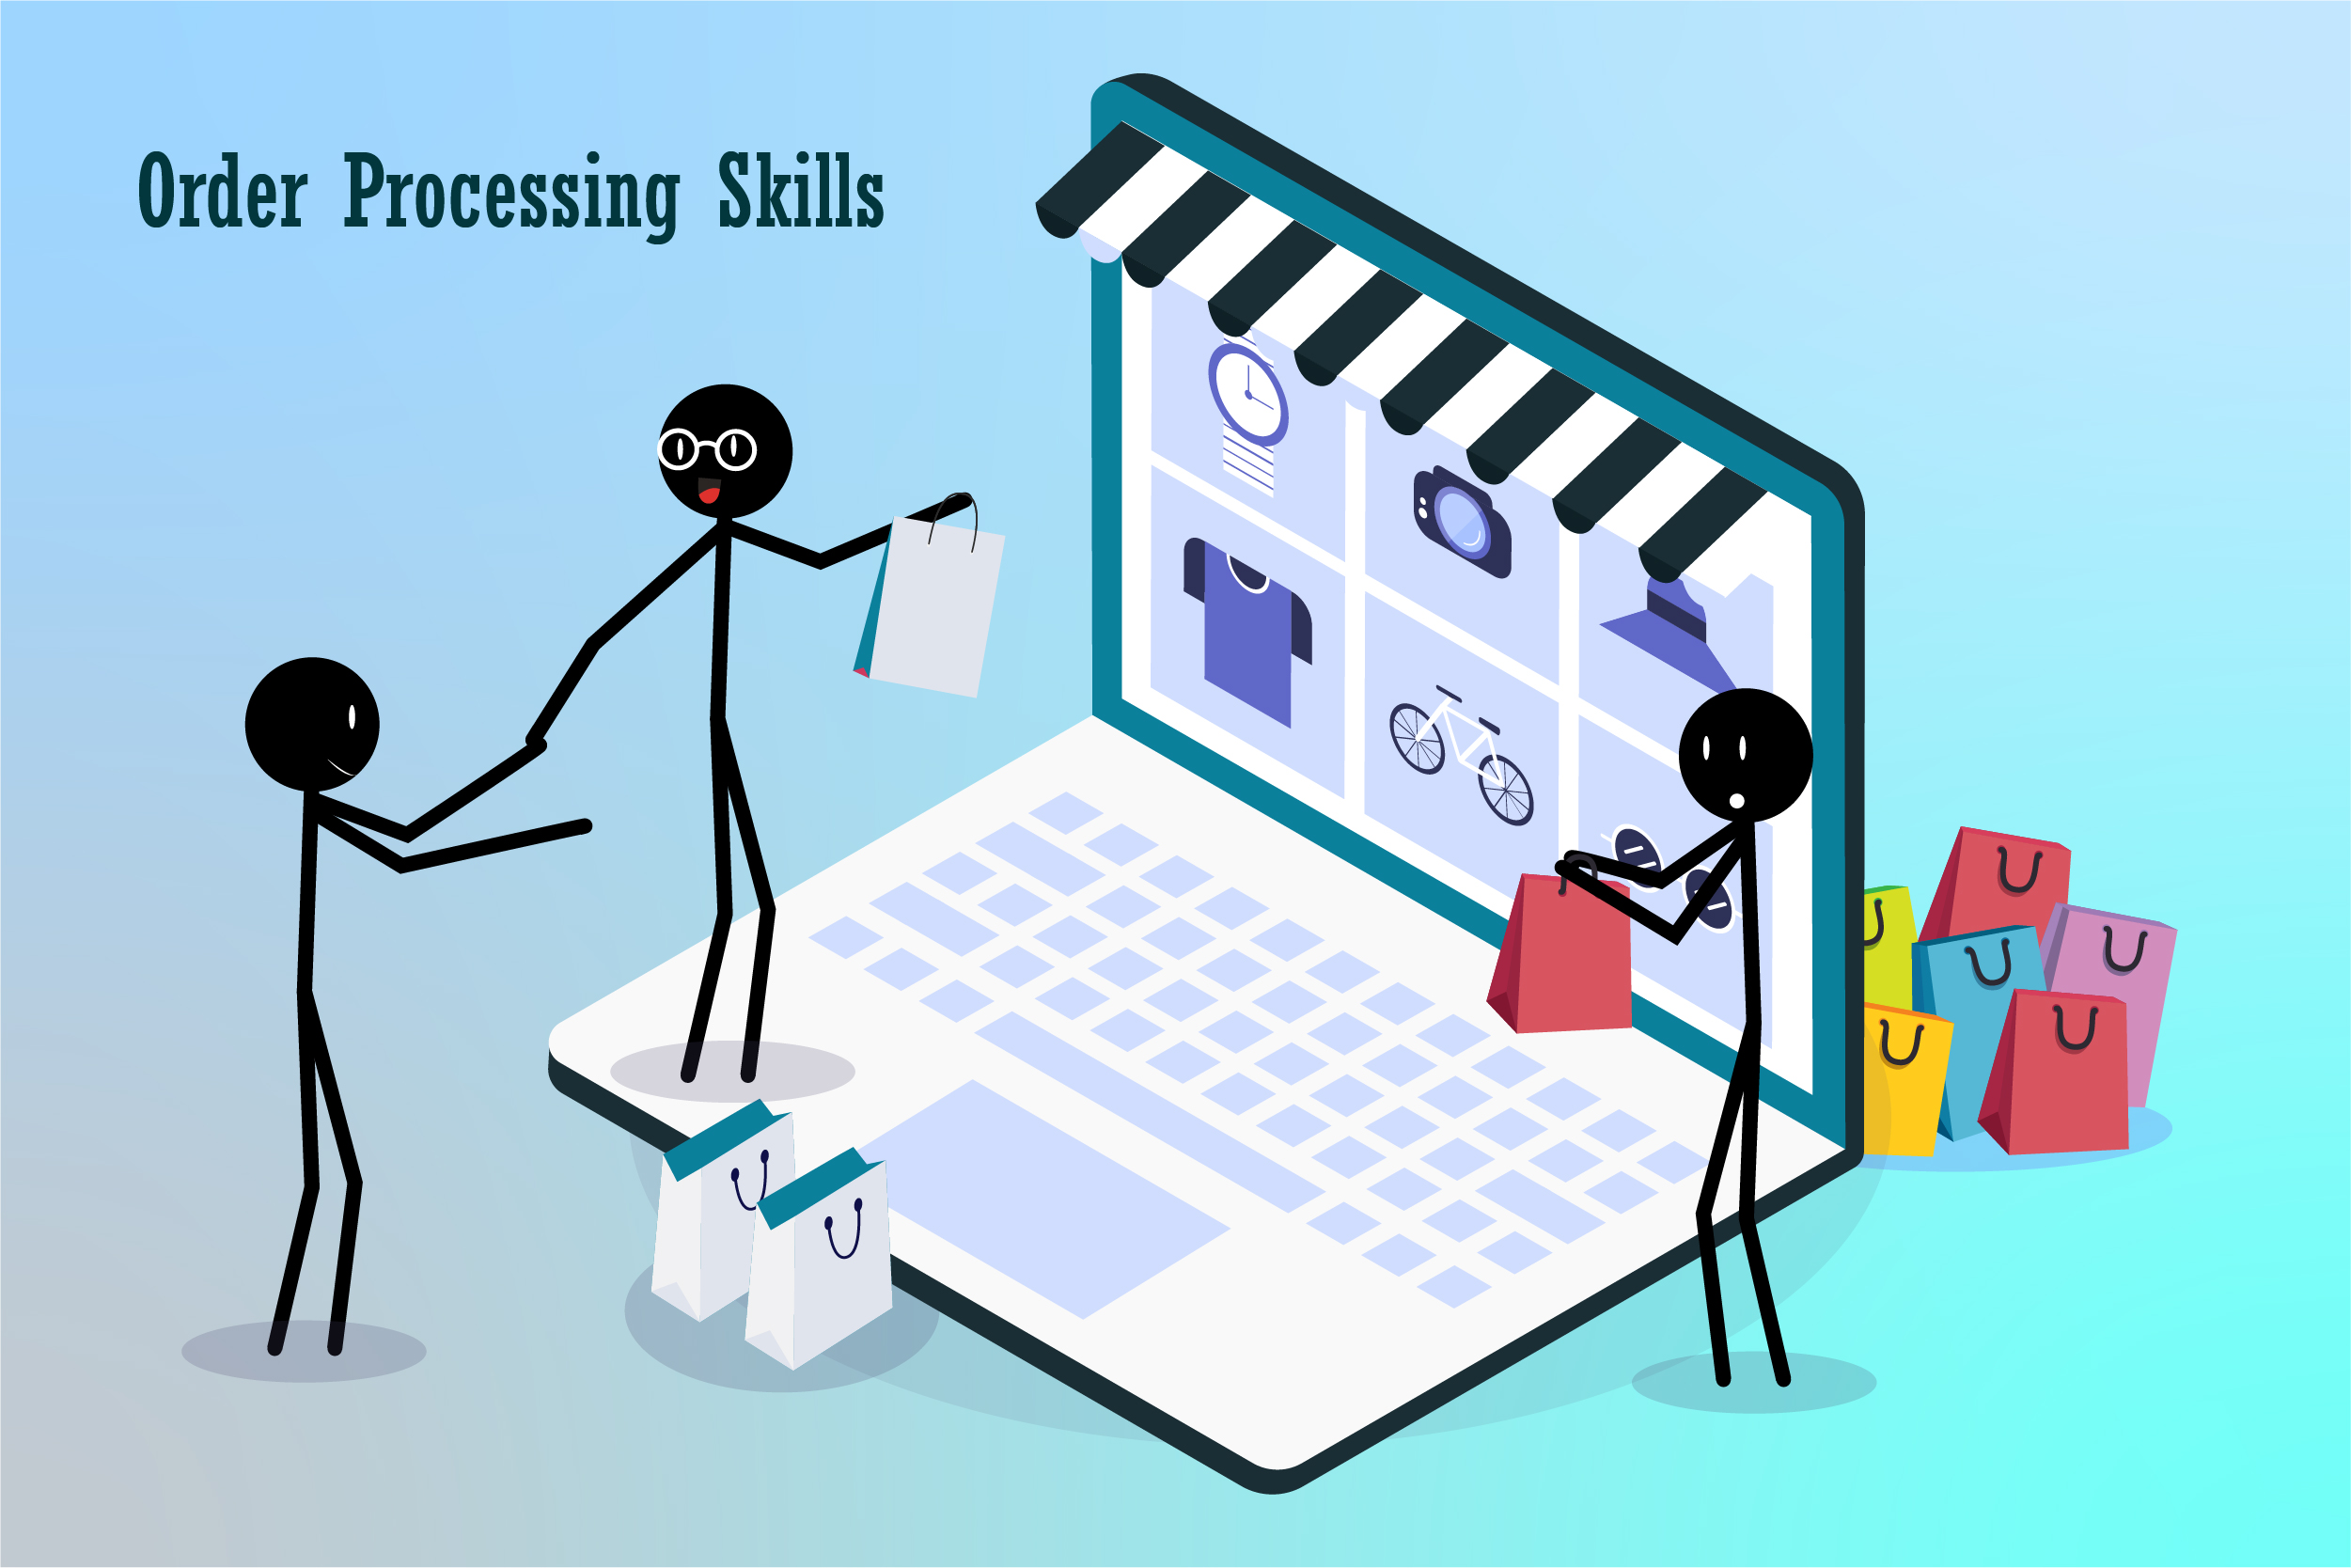 Order Processing Skills